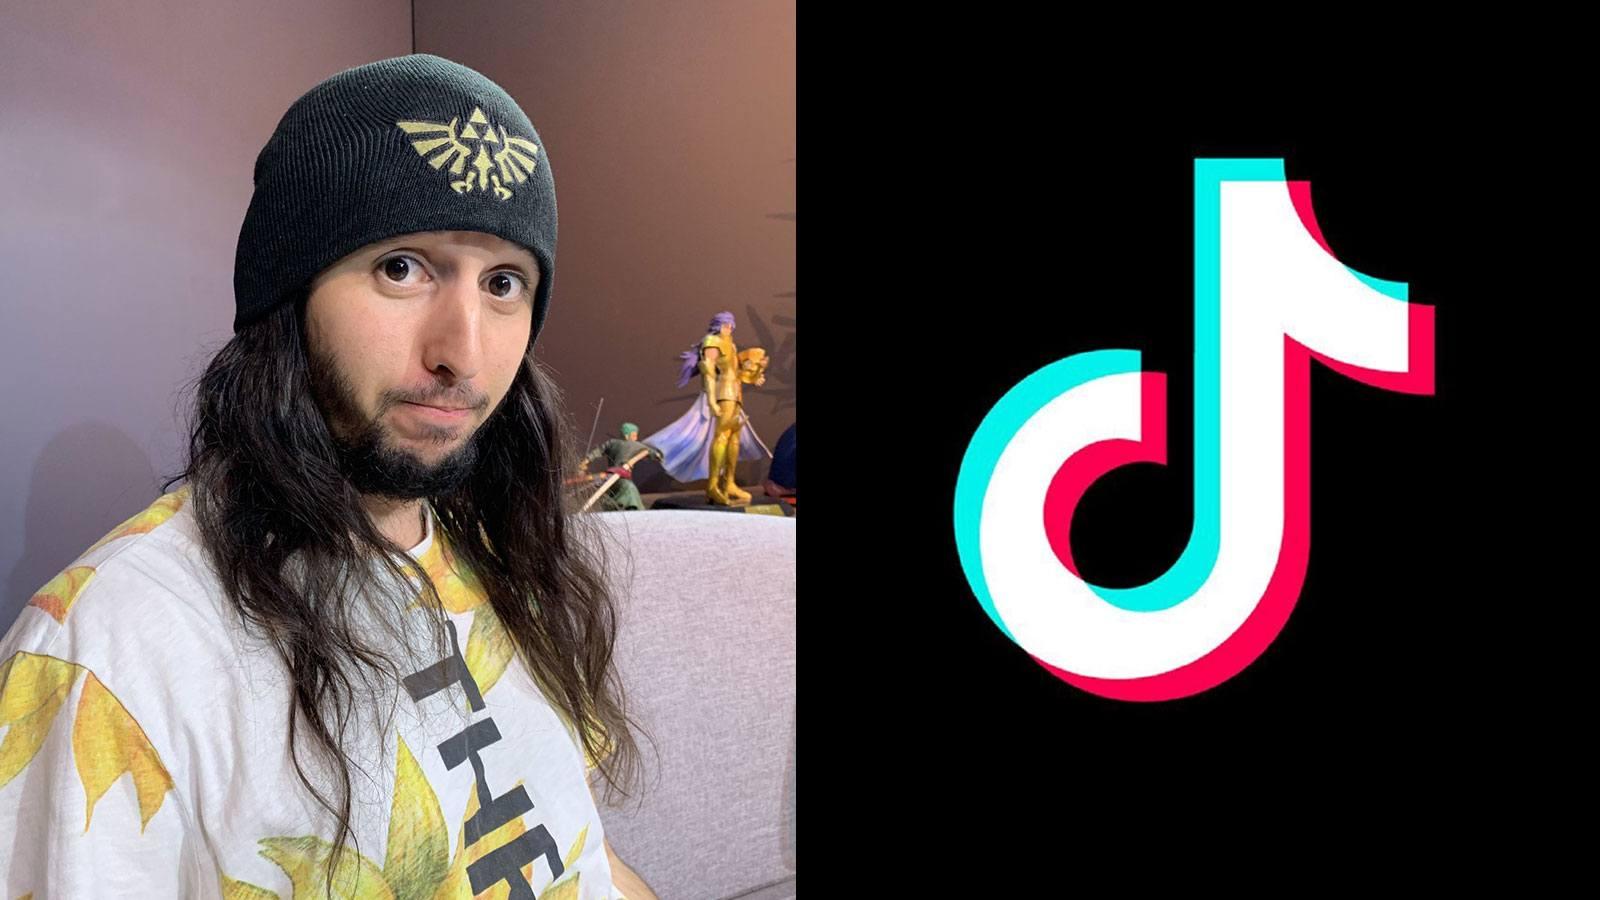 Jiraya LeStream Twitch | TikTok